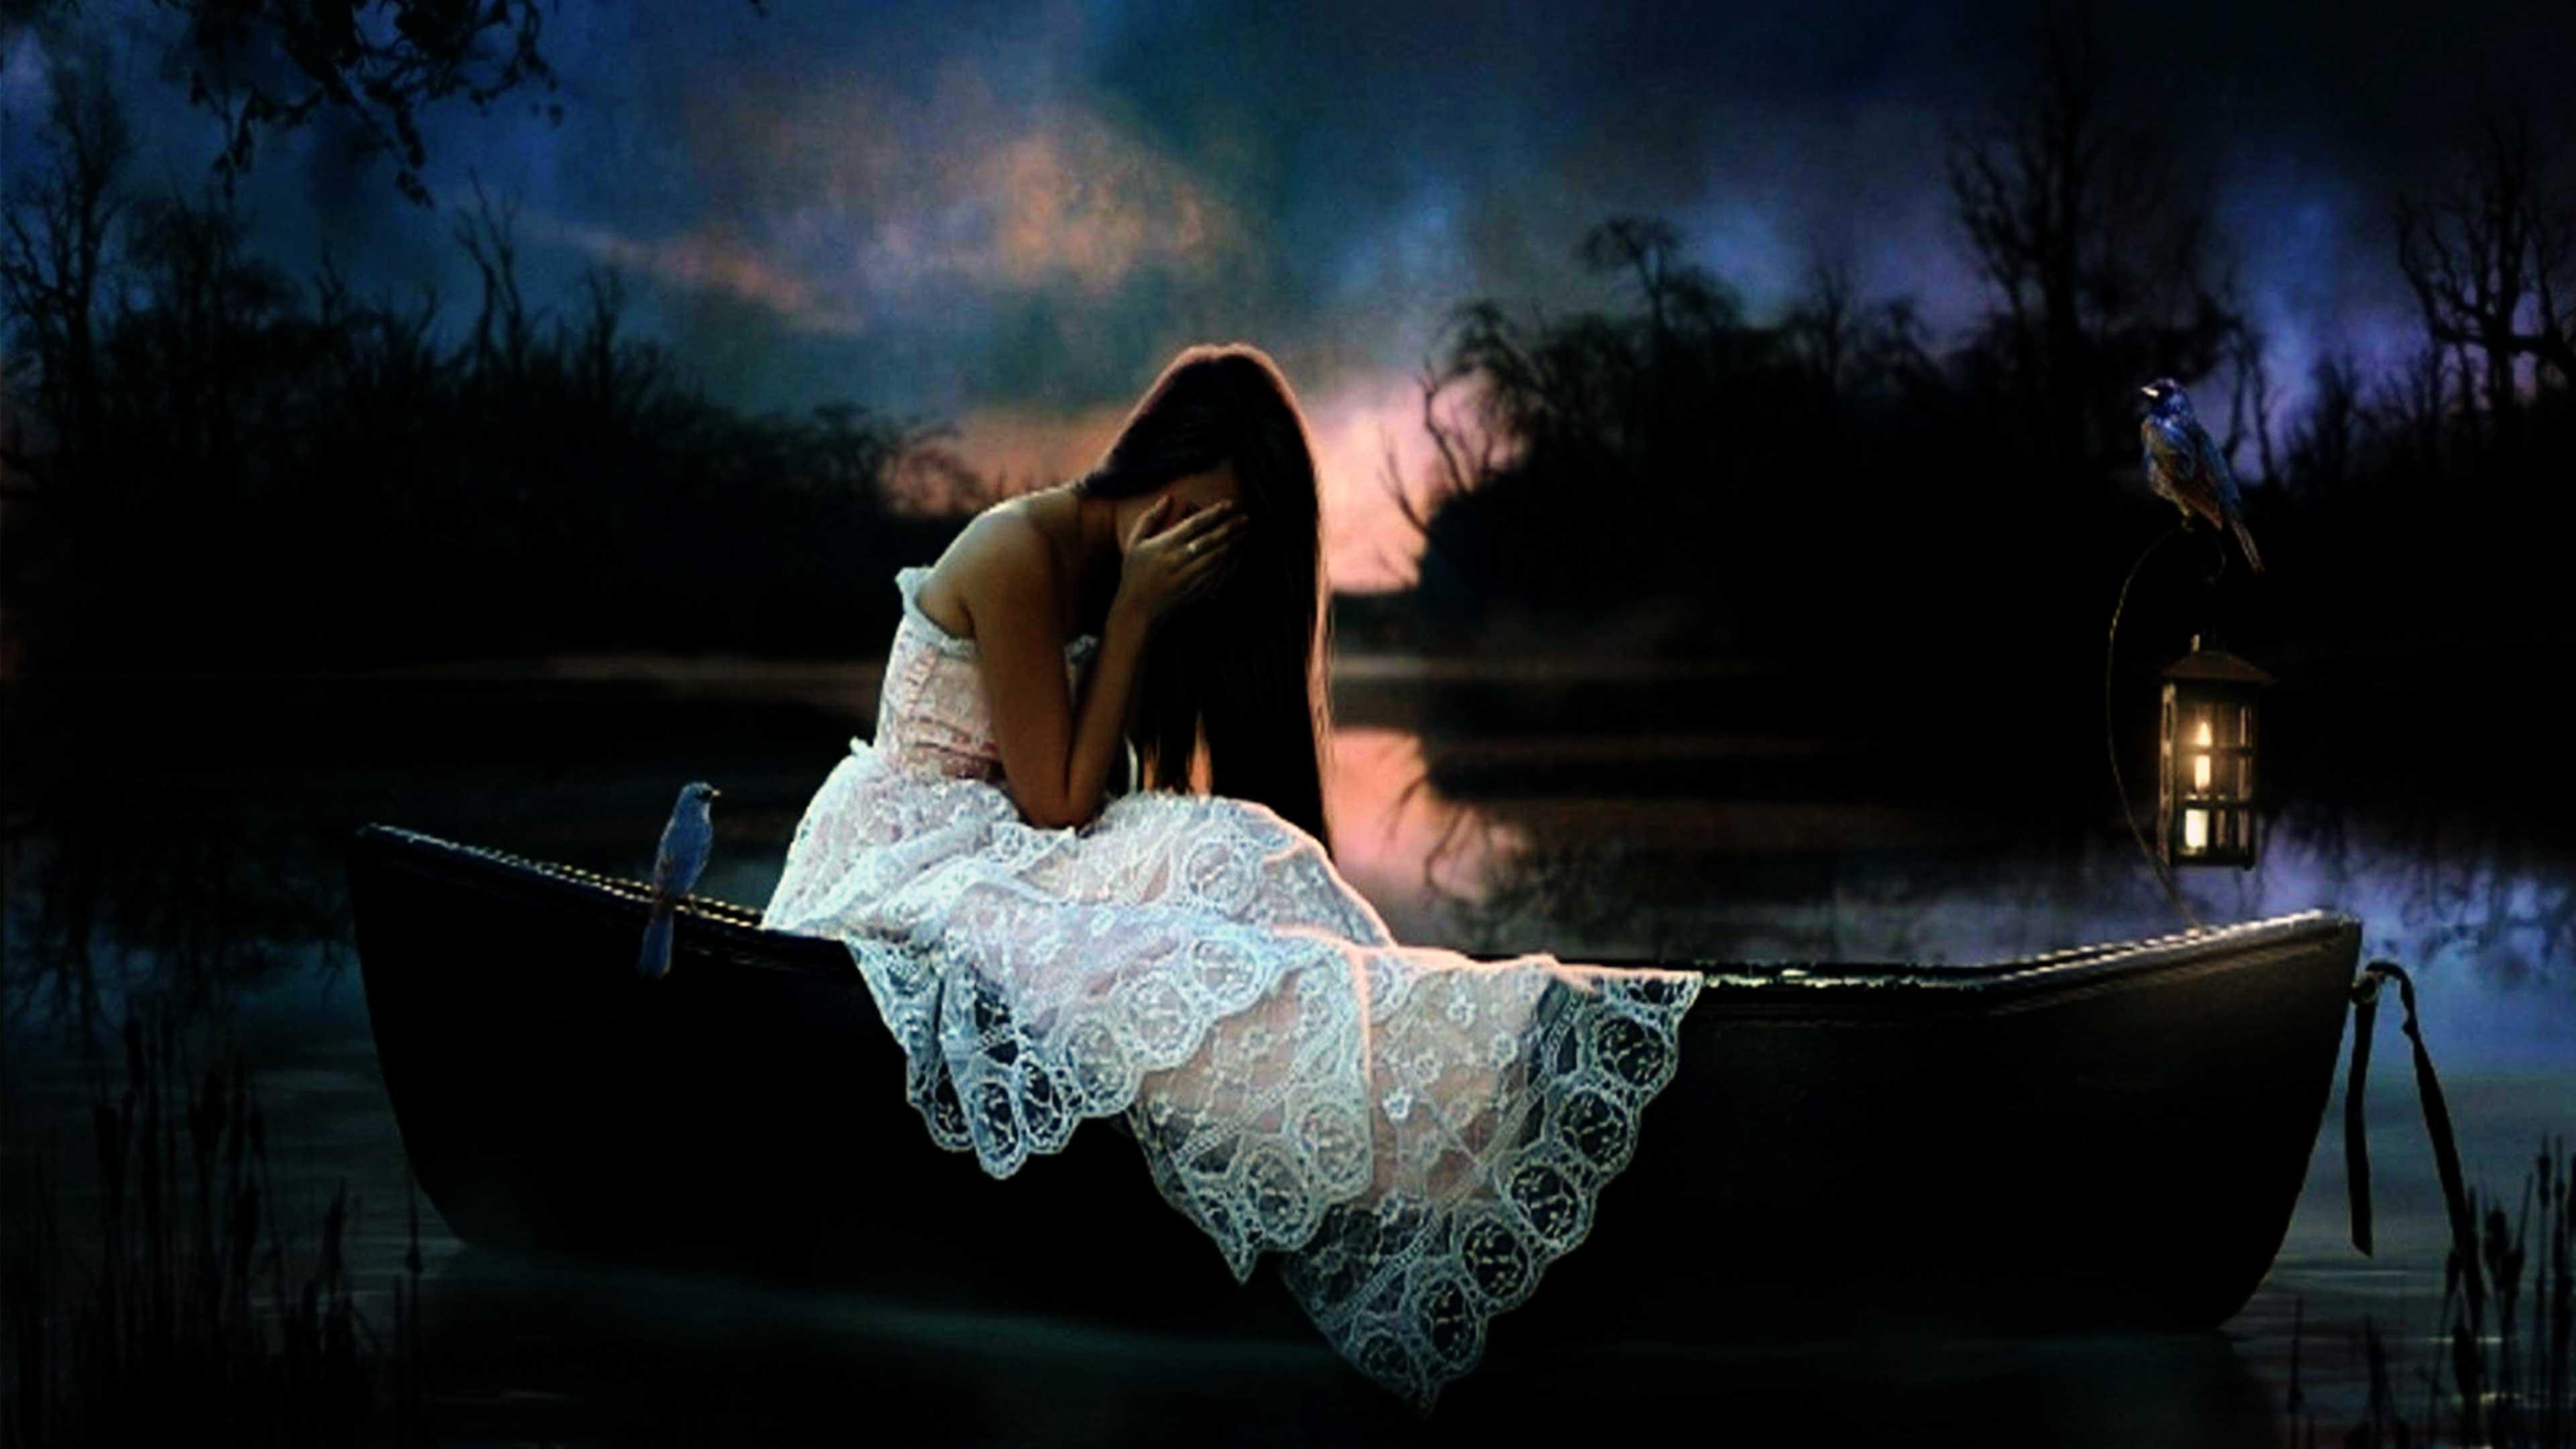 Sad Girl Images   Sad Girls Crying & Sitting Alone Wallpapers